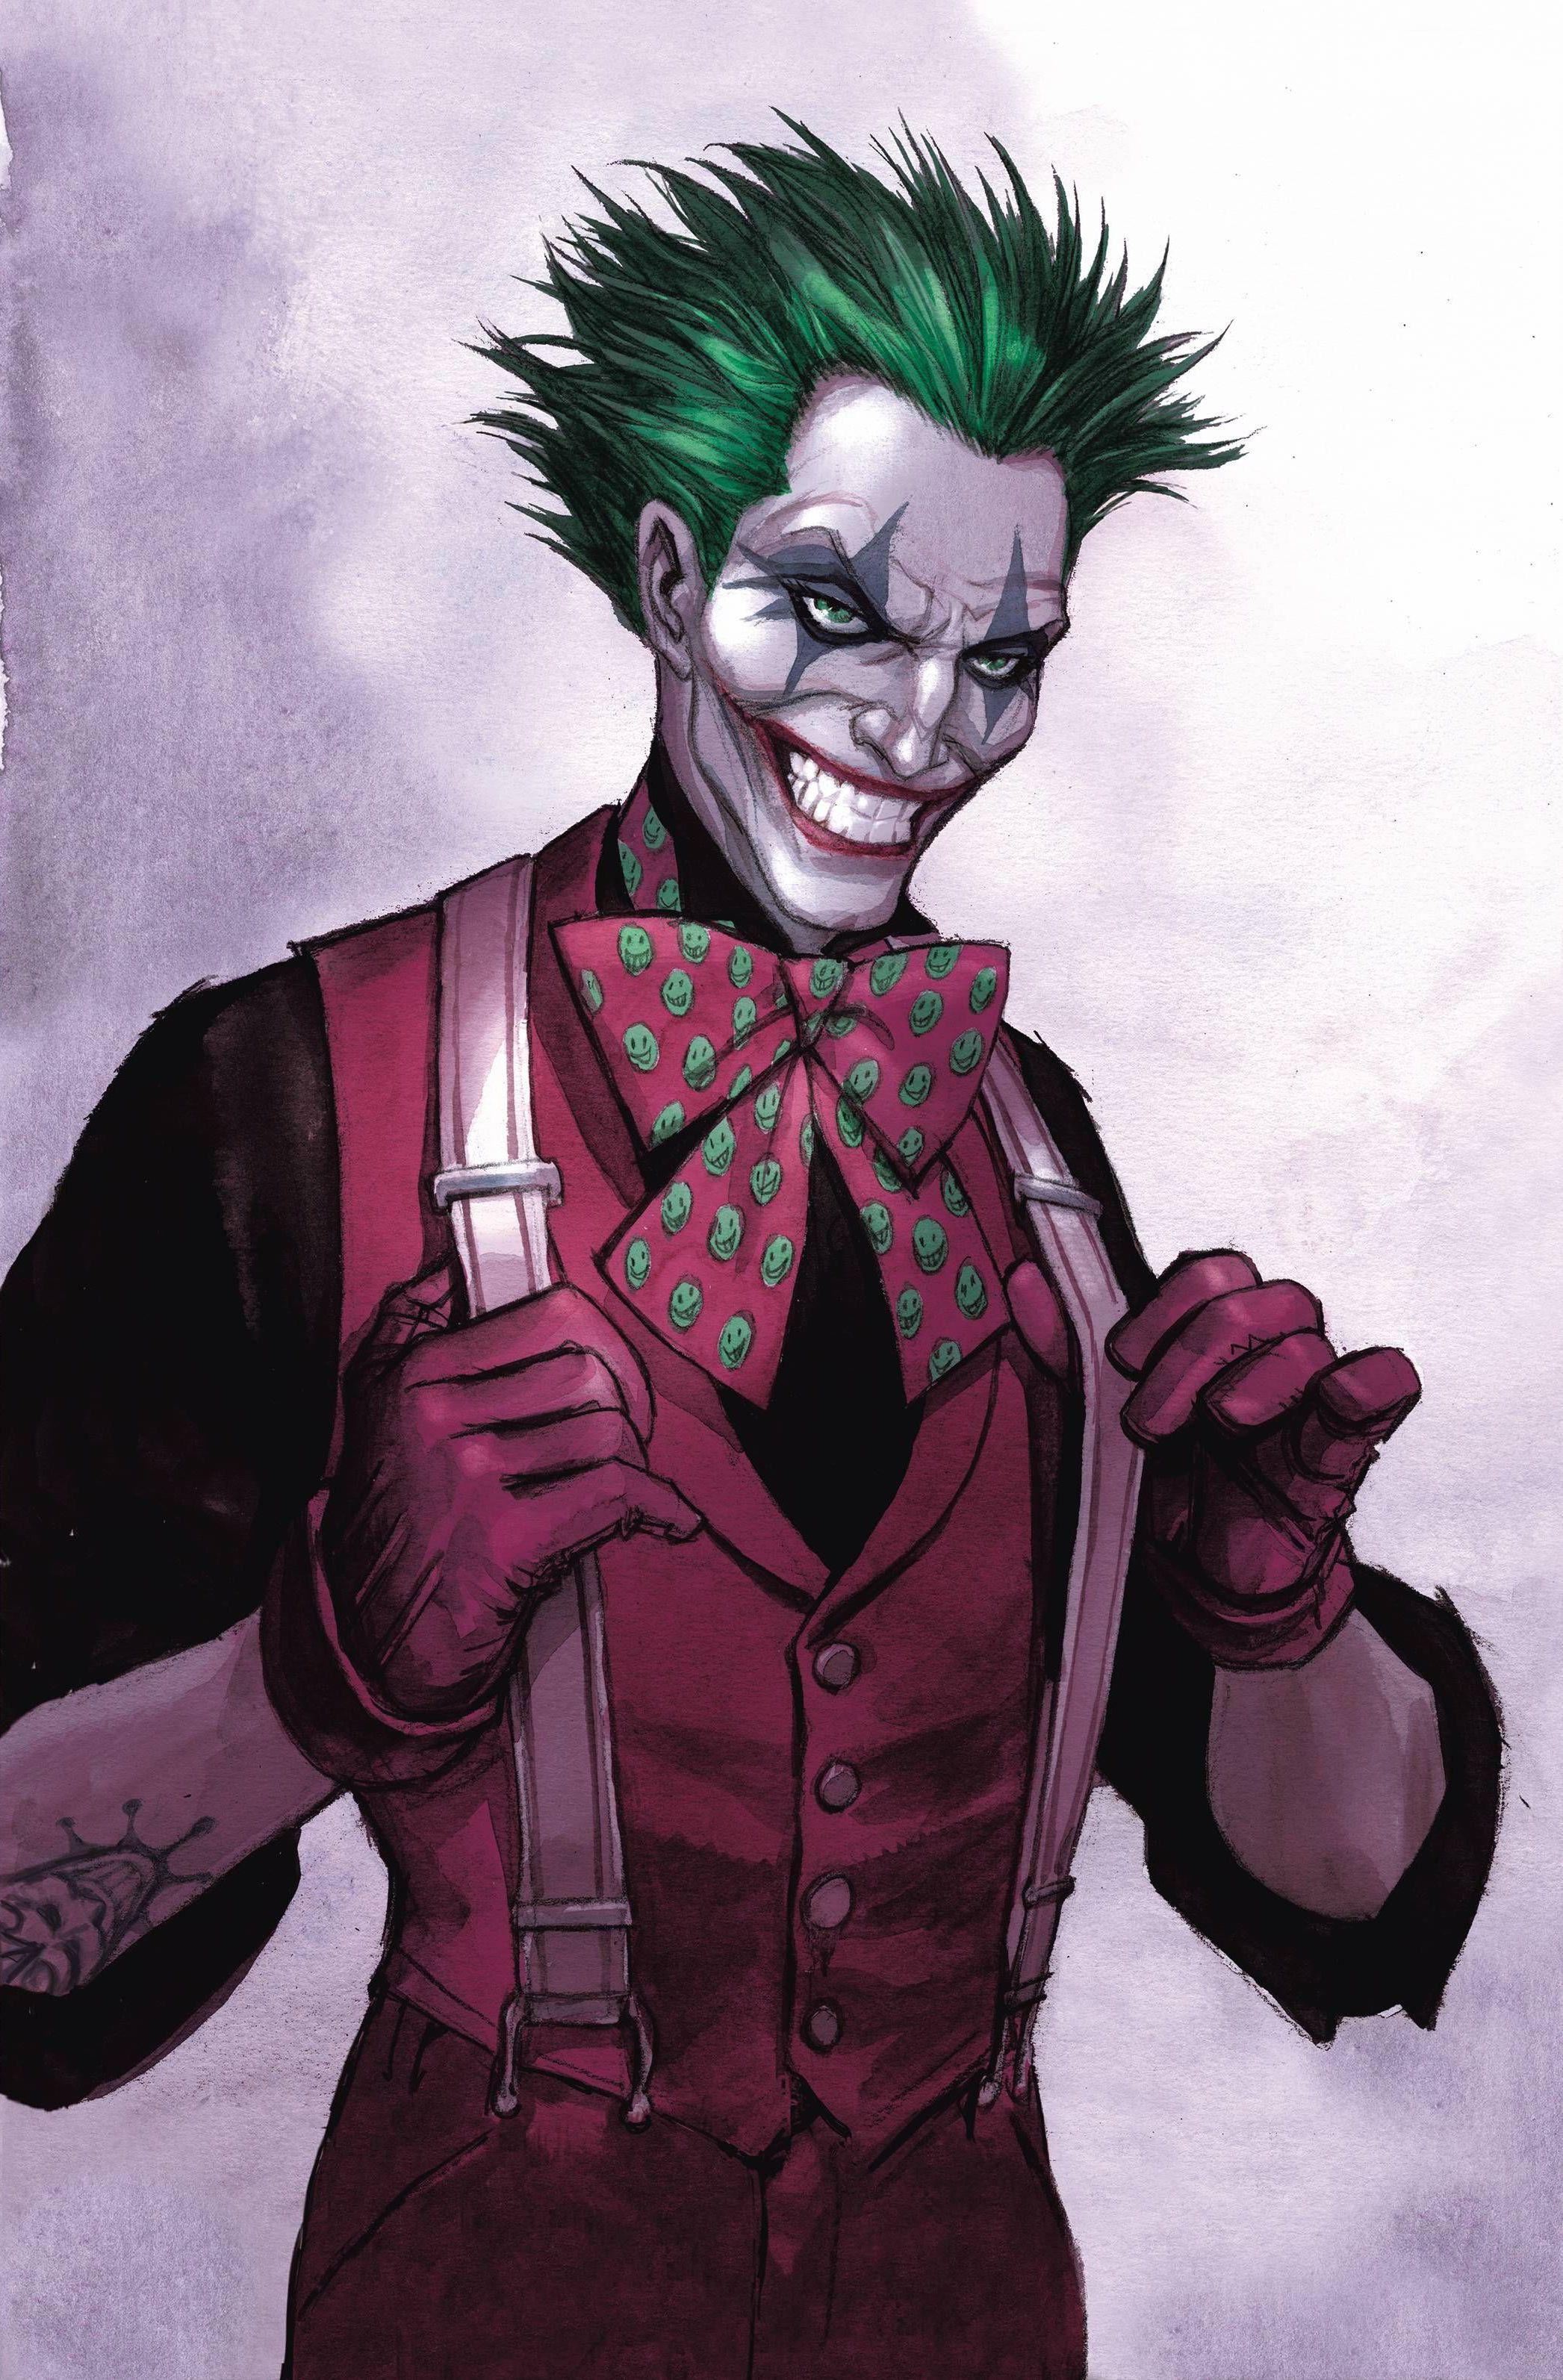 Joker (The Dark Prince Charming)